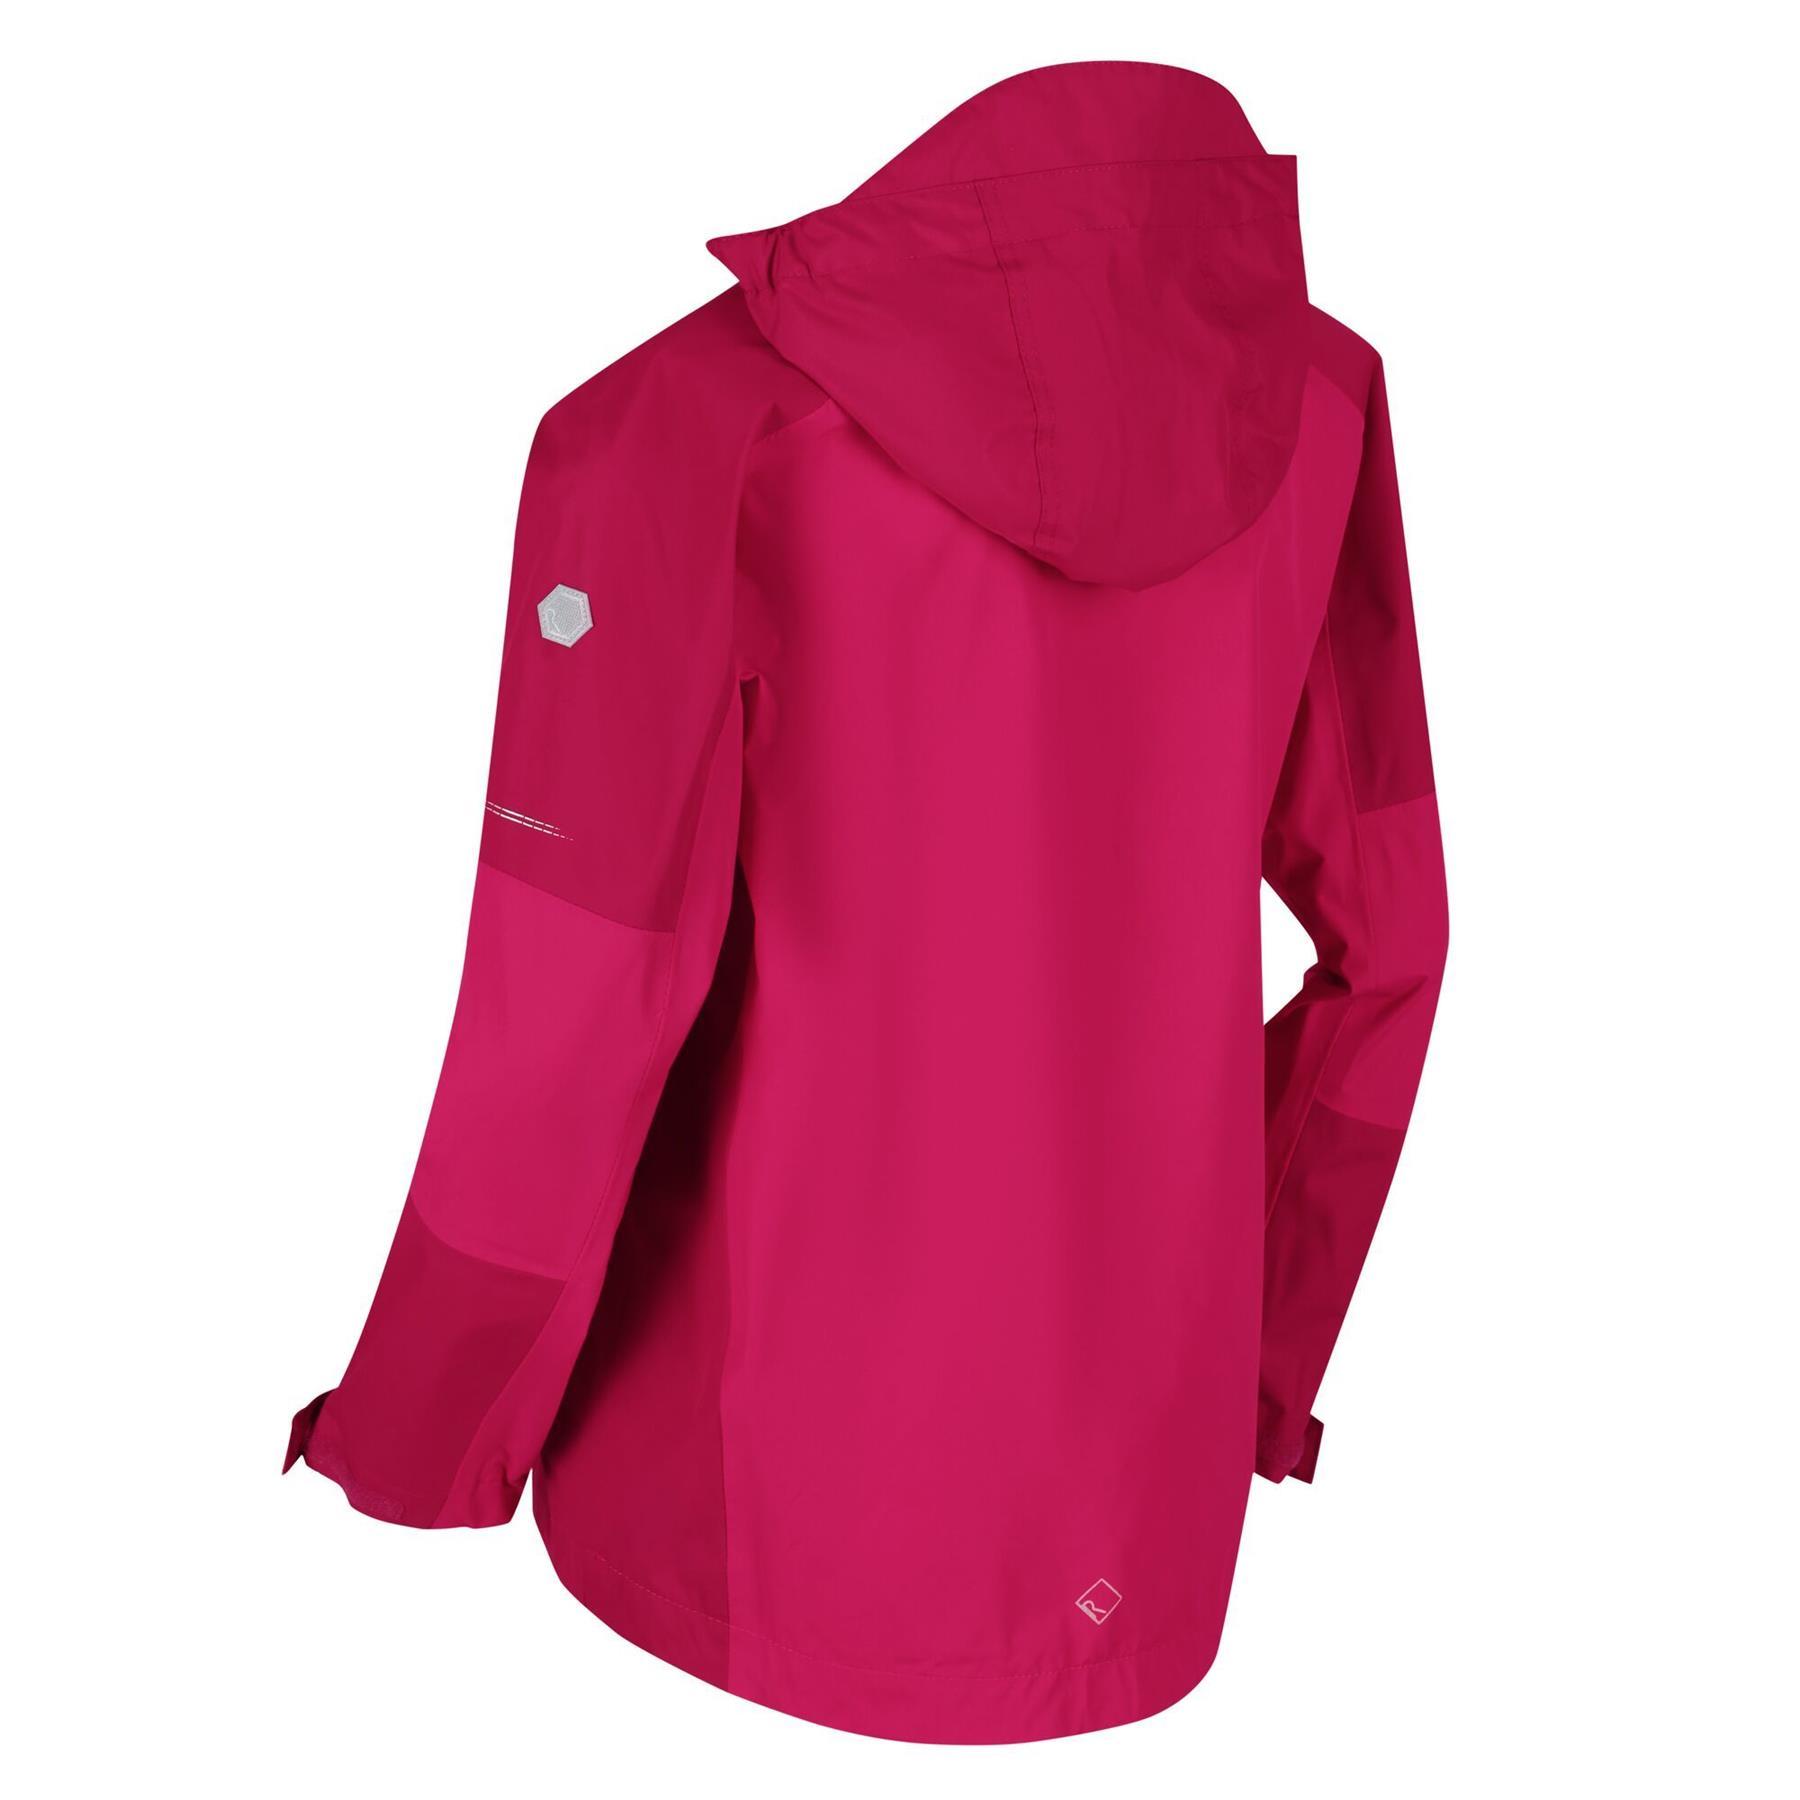 miniatuur 6 - Regatta Kids Calderdale II Waterproof Hooded Zip Pocket Jacket Boy Girls Coat